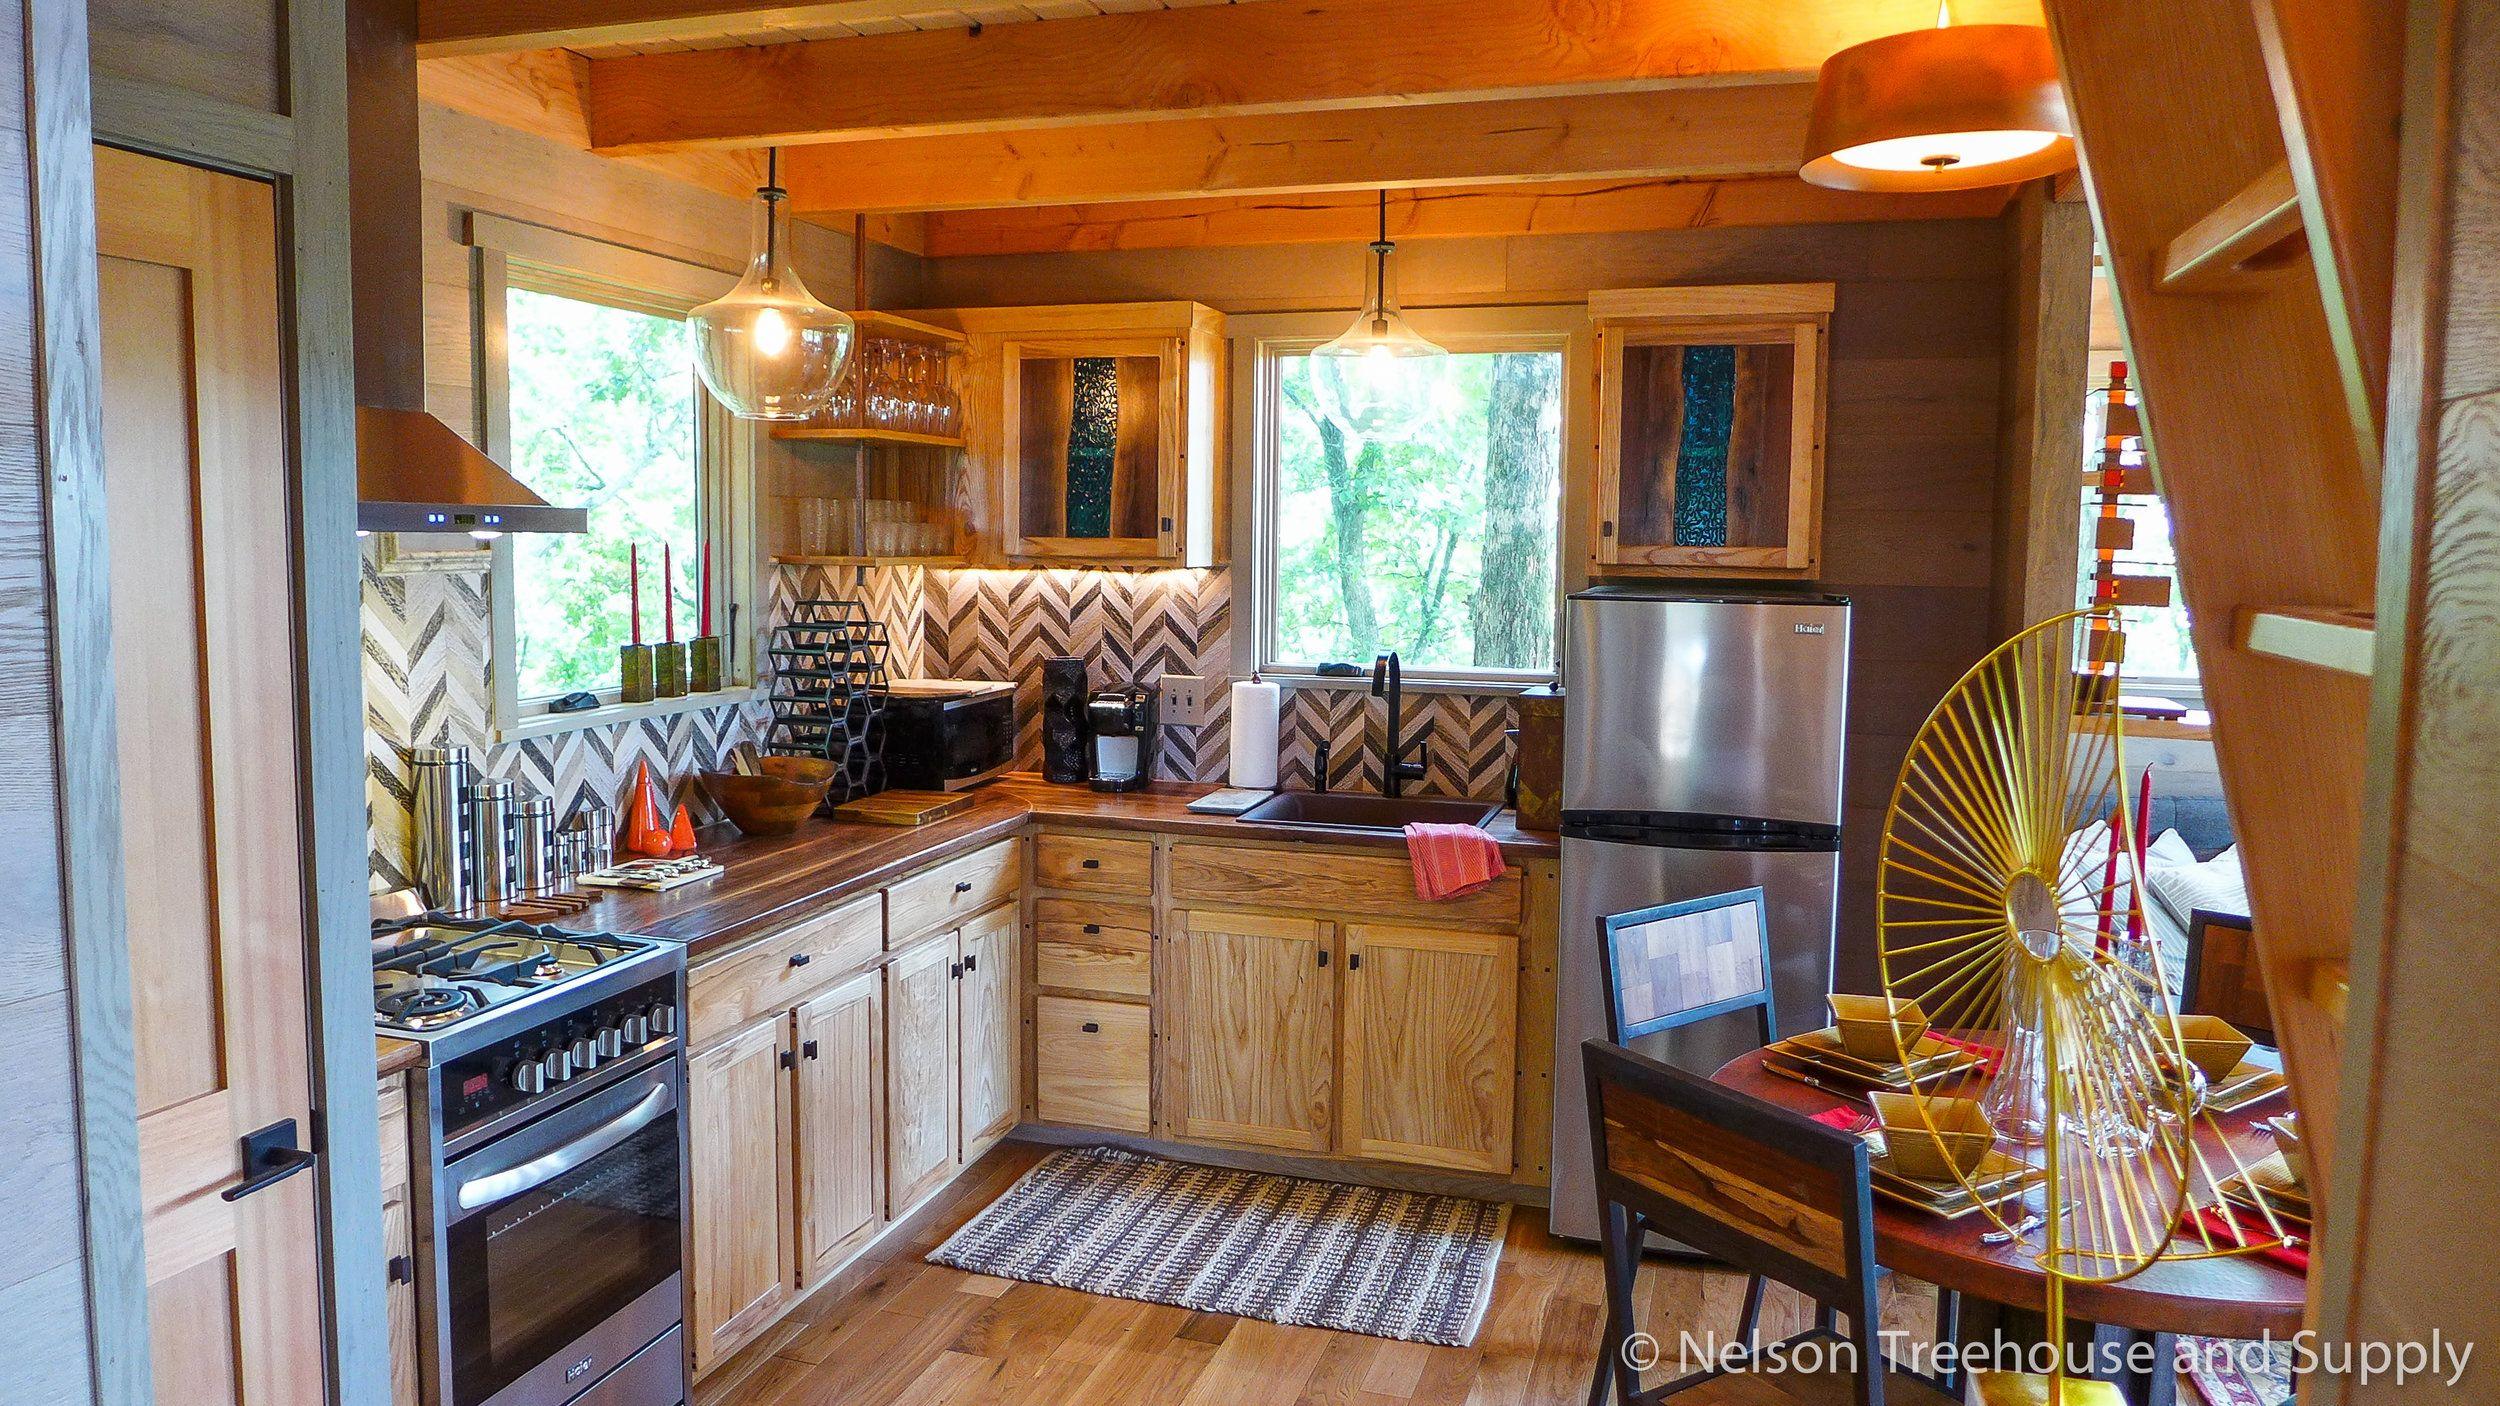 Incroyable Frank Lloyd Wright Treehouse Kitchen  Pete Nelson